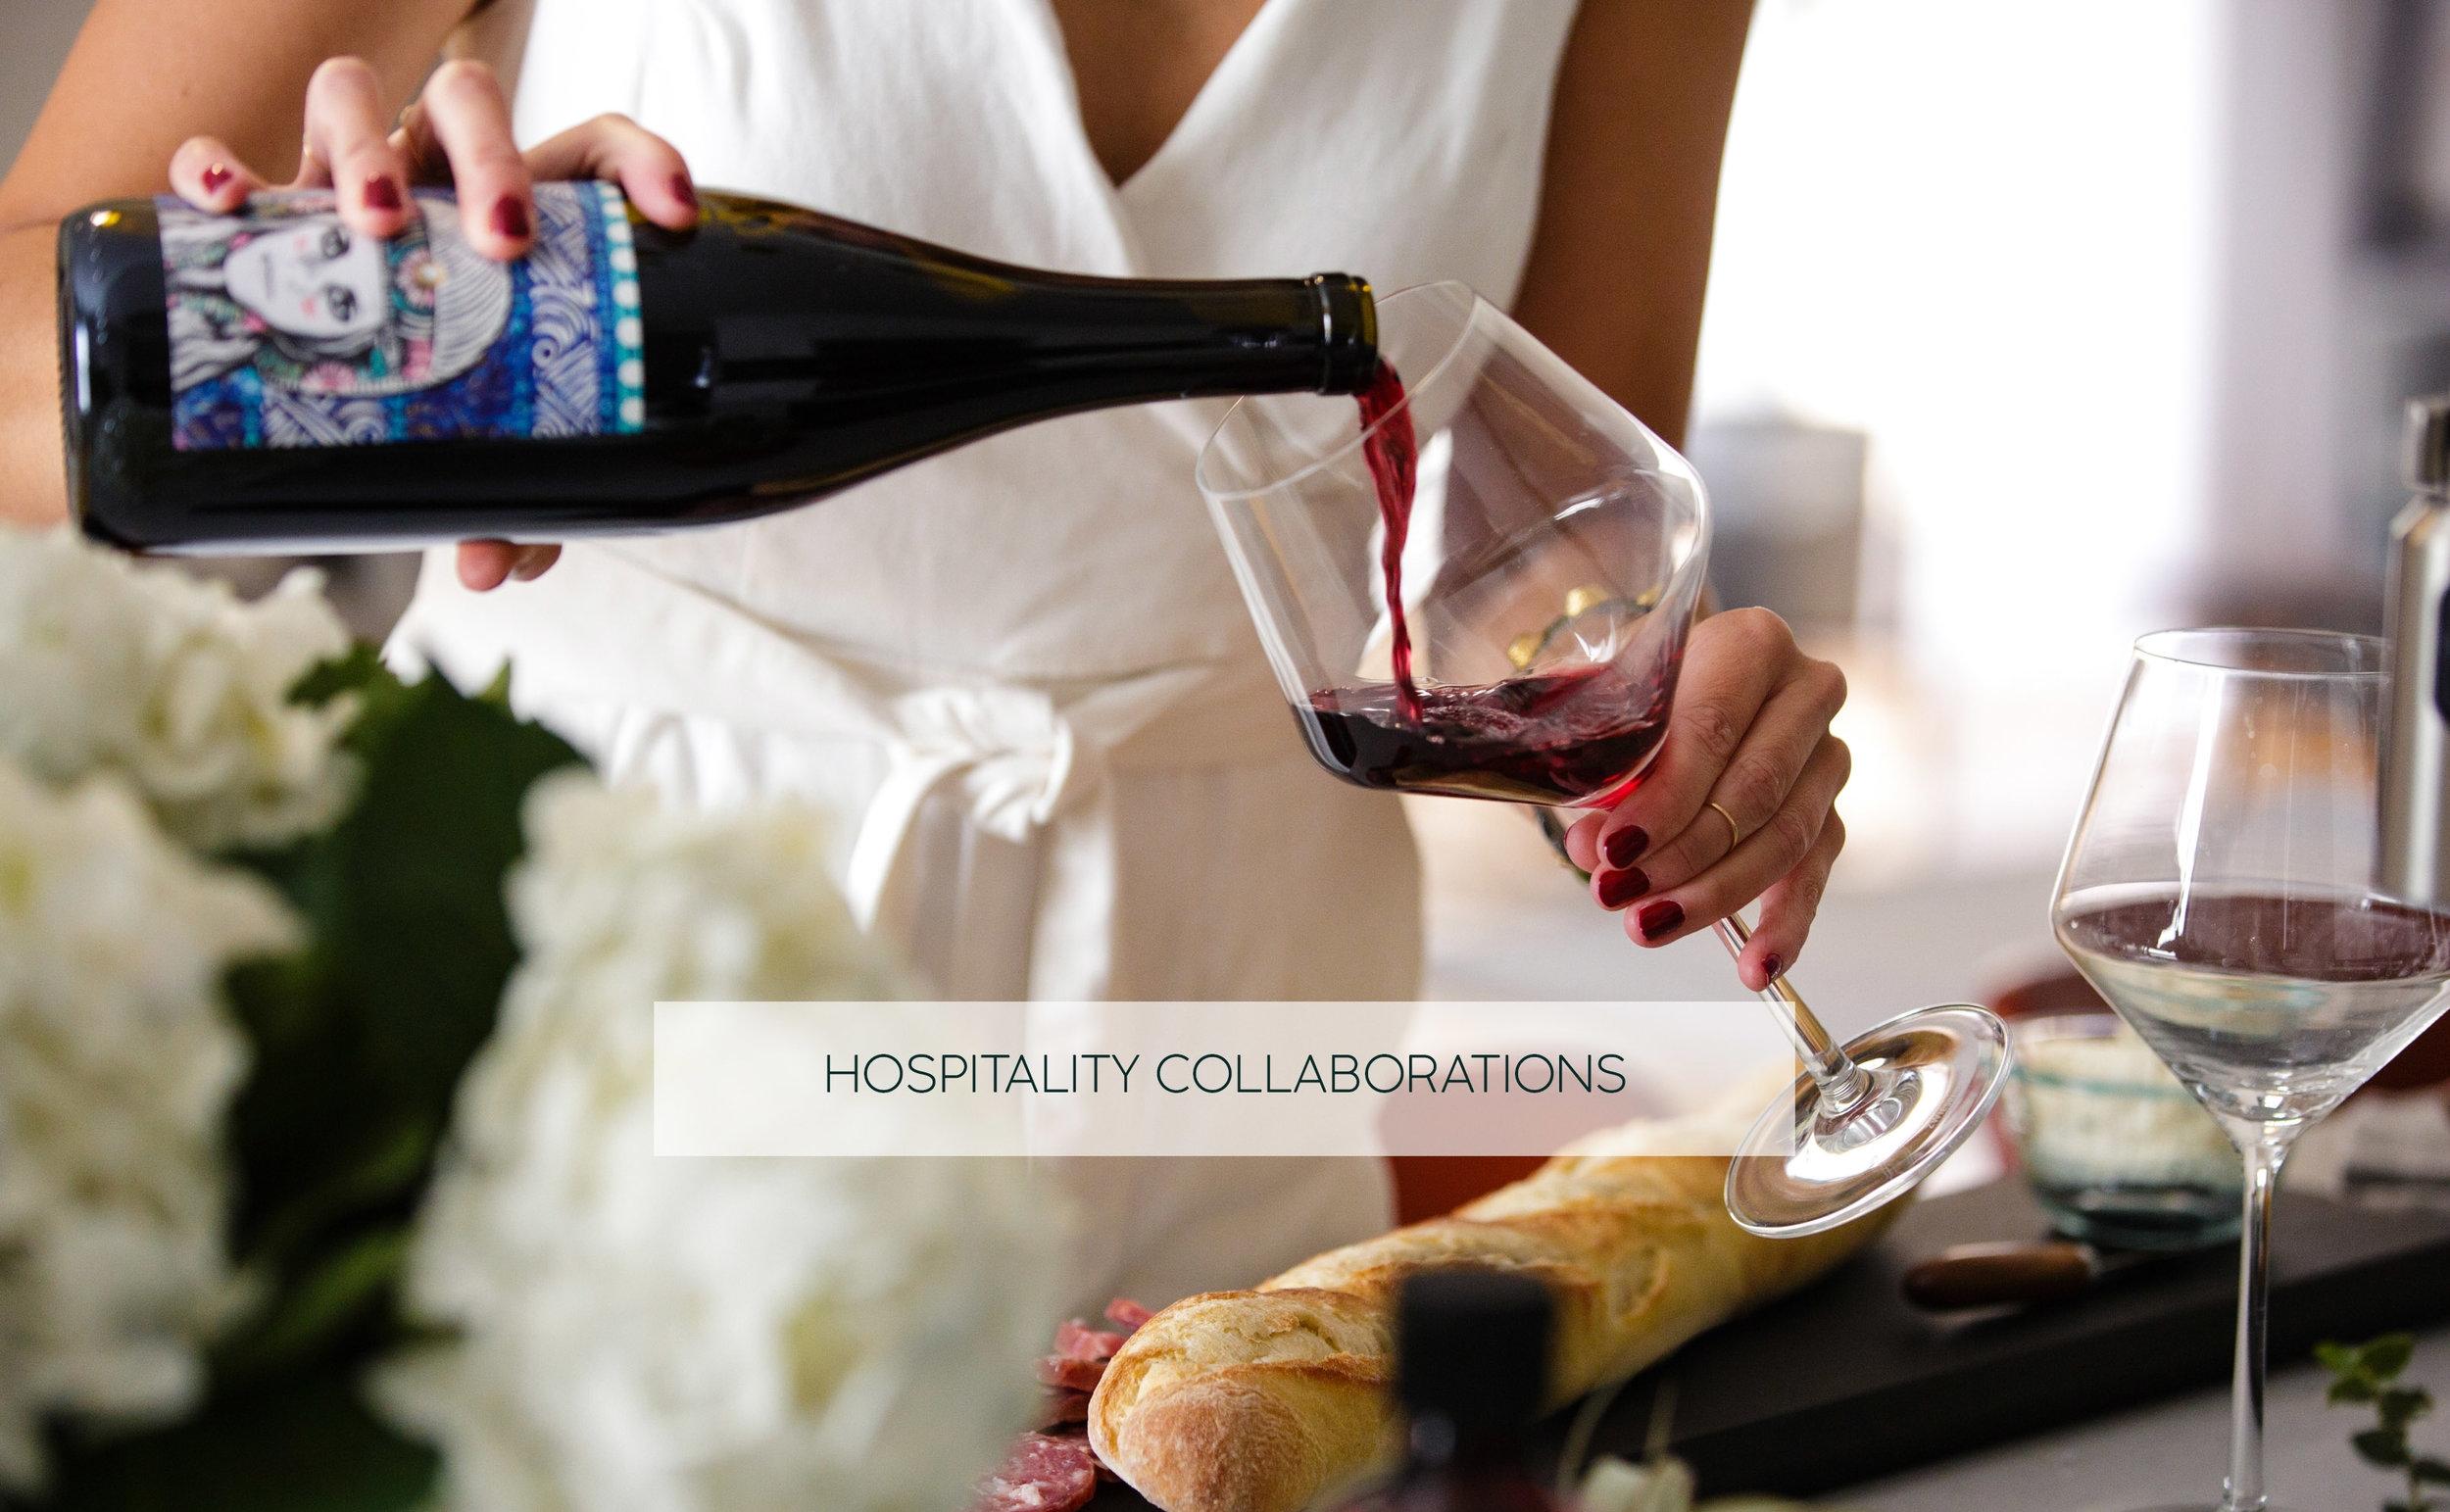 Hospitality_Collaborations.jpg